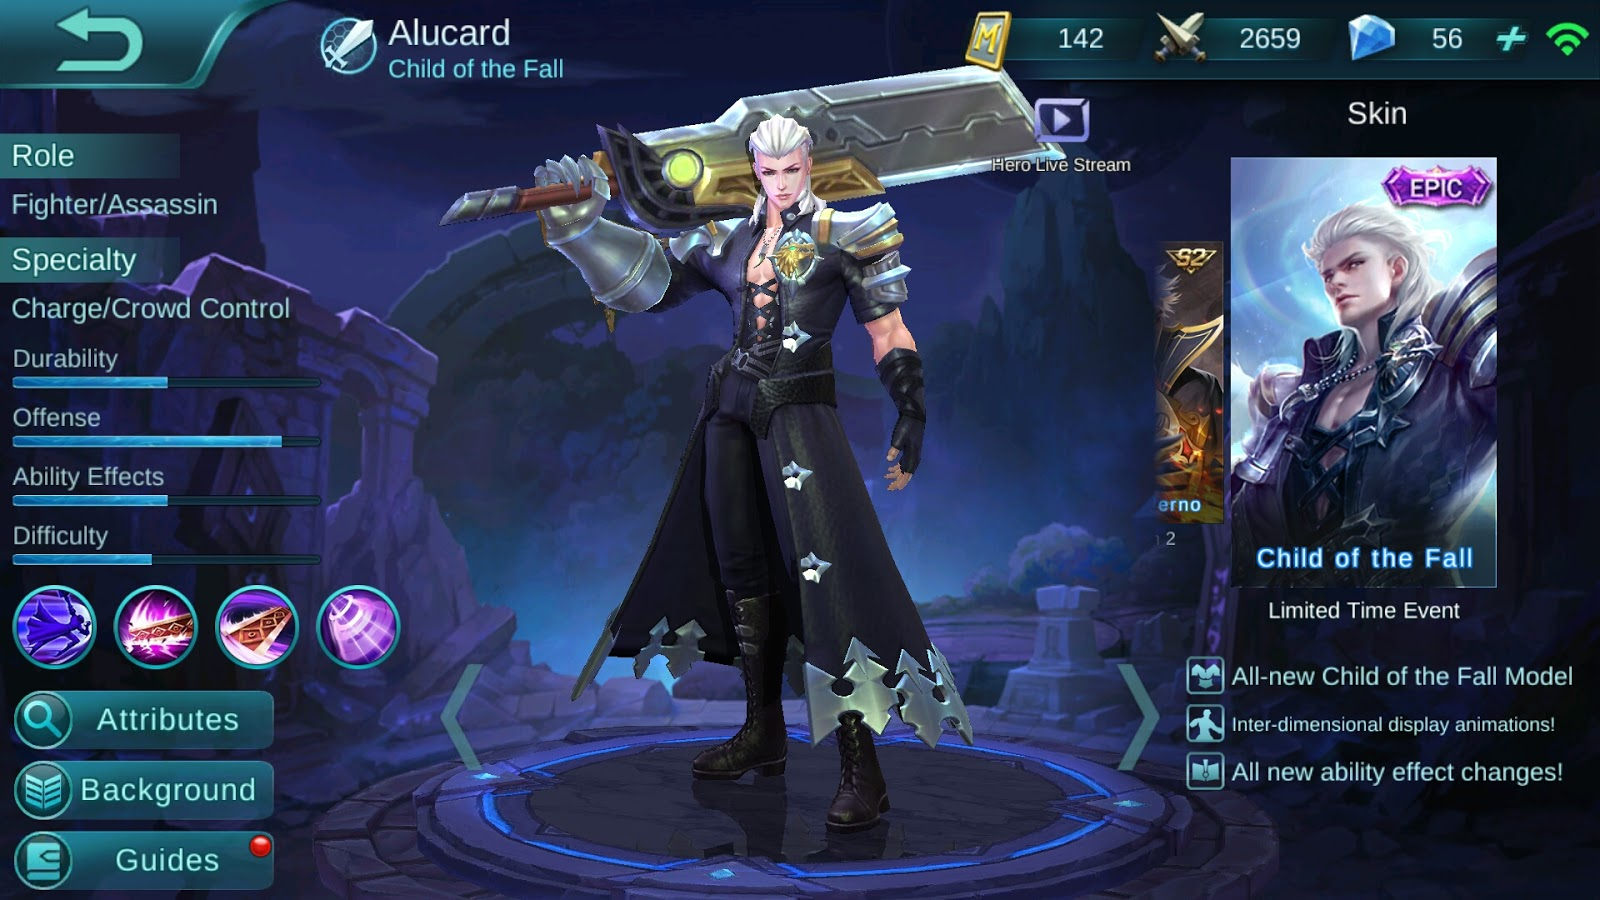 Wallpaper Mobile Legend Alucard Fiery Inferno Gudang Wallpaper